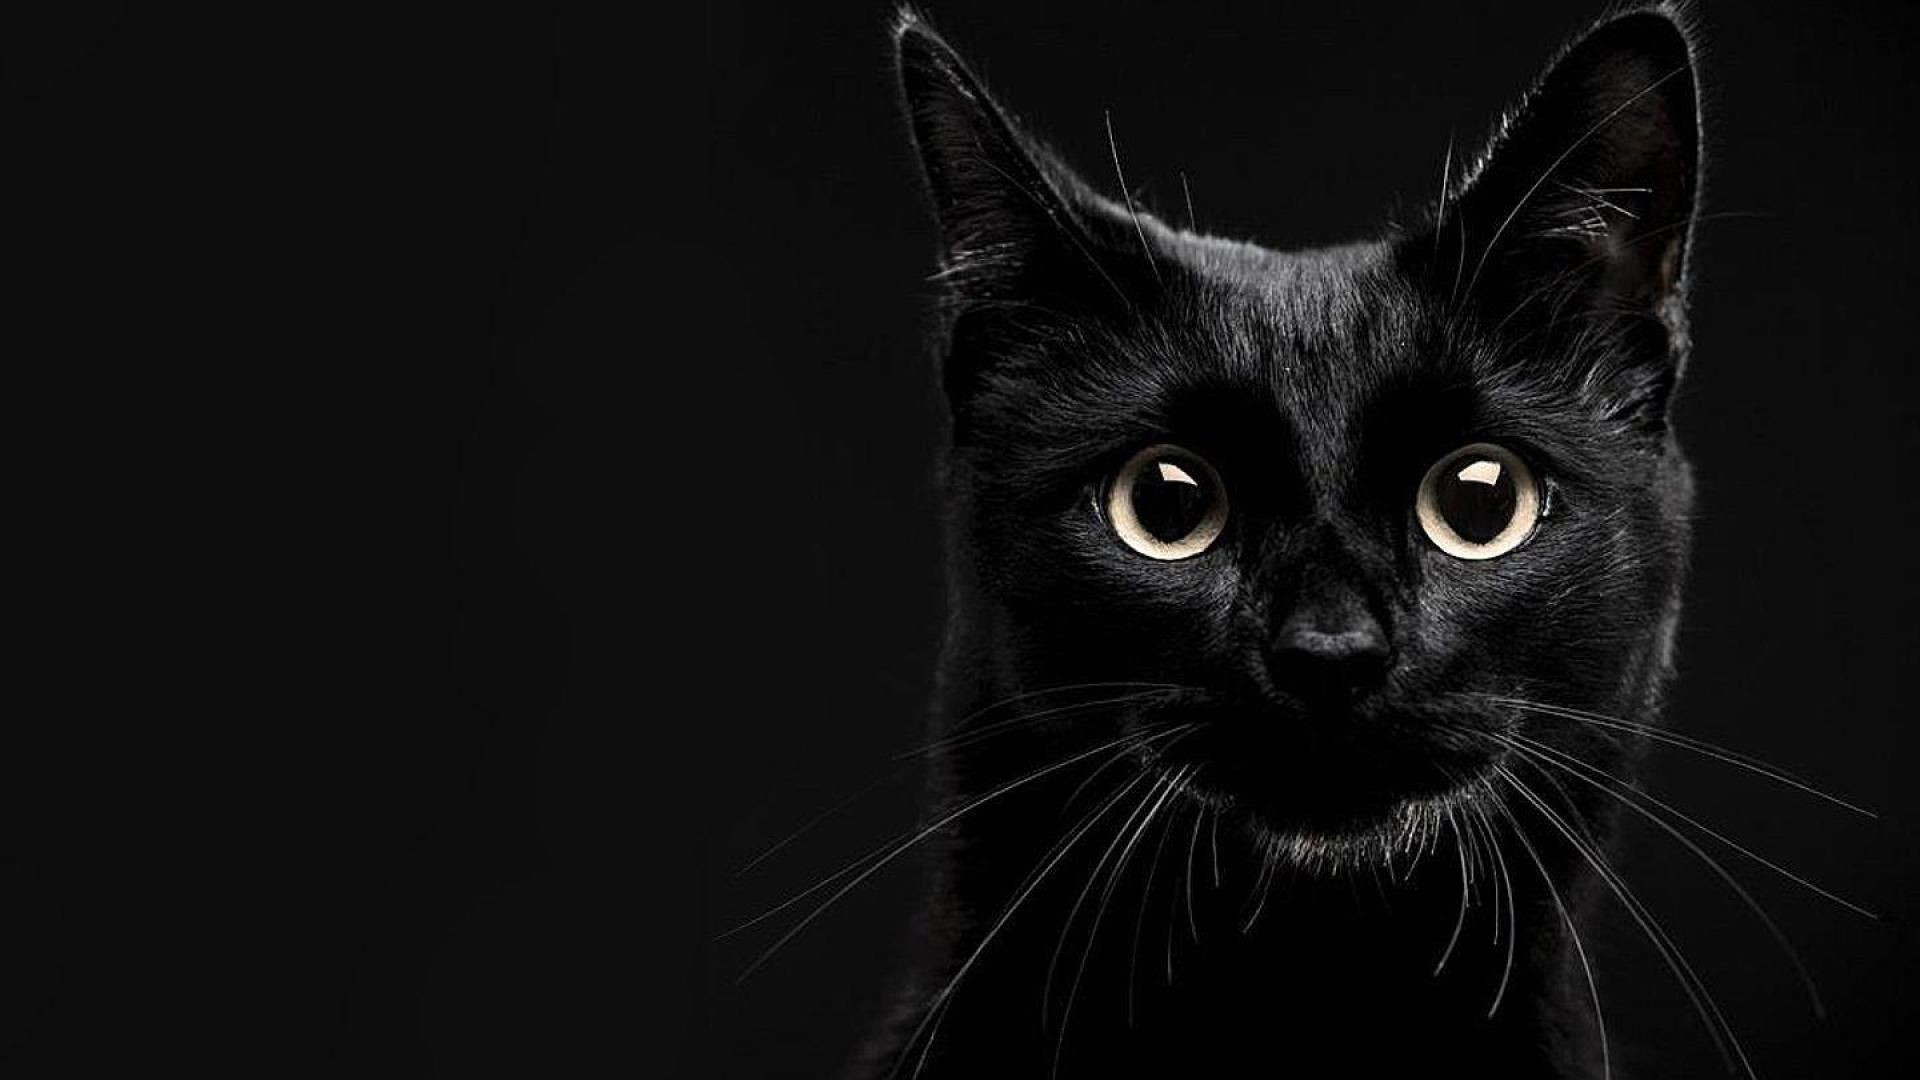 Black Cat free background